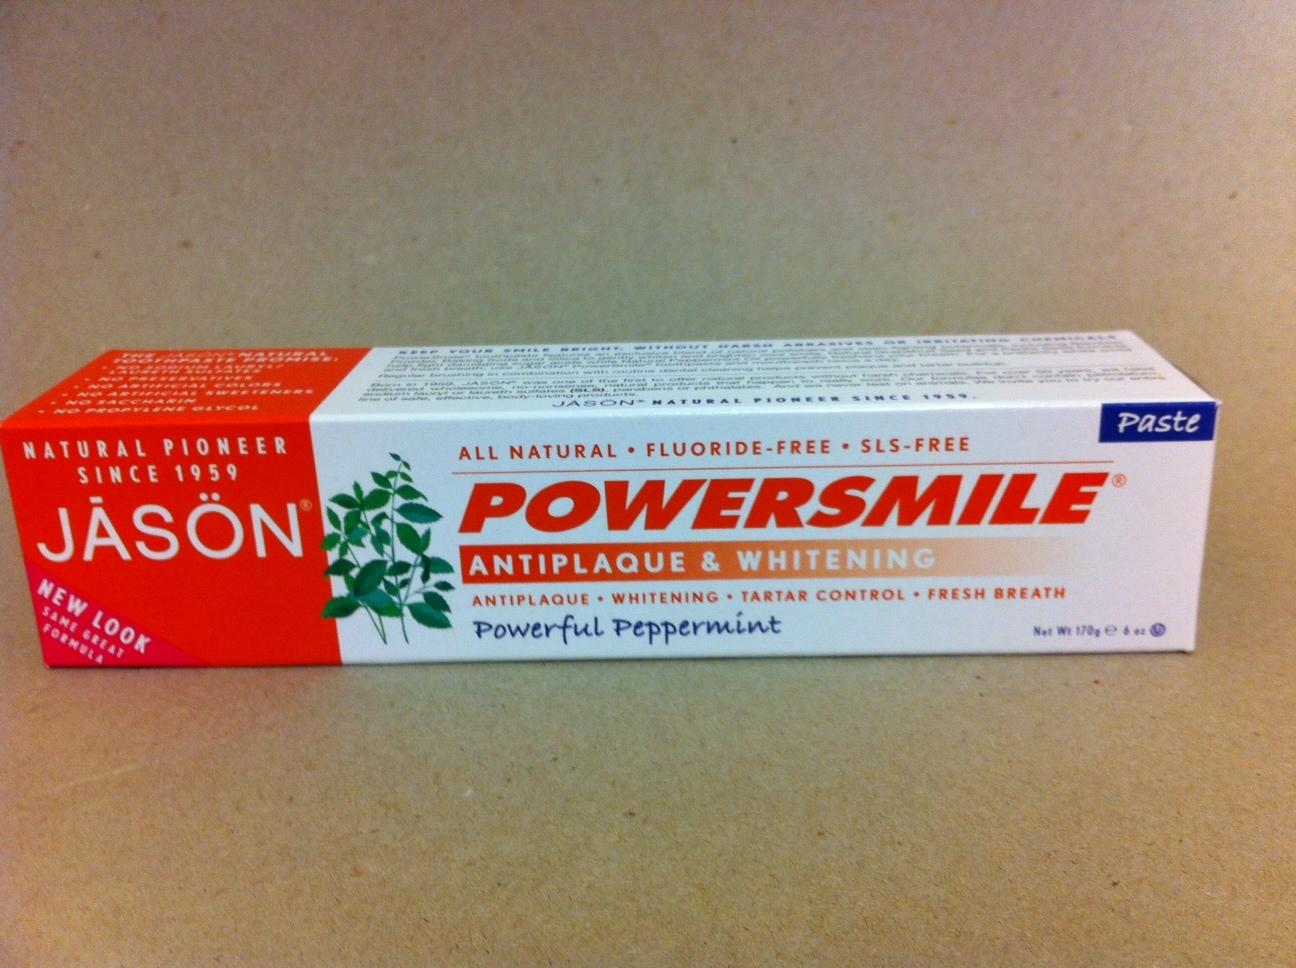 Jason Powerful Peppermint Toothpaste 1496